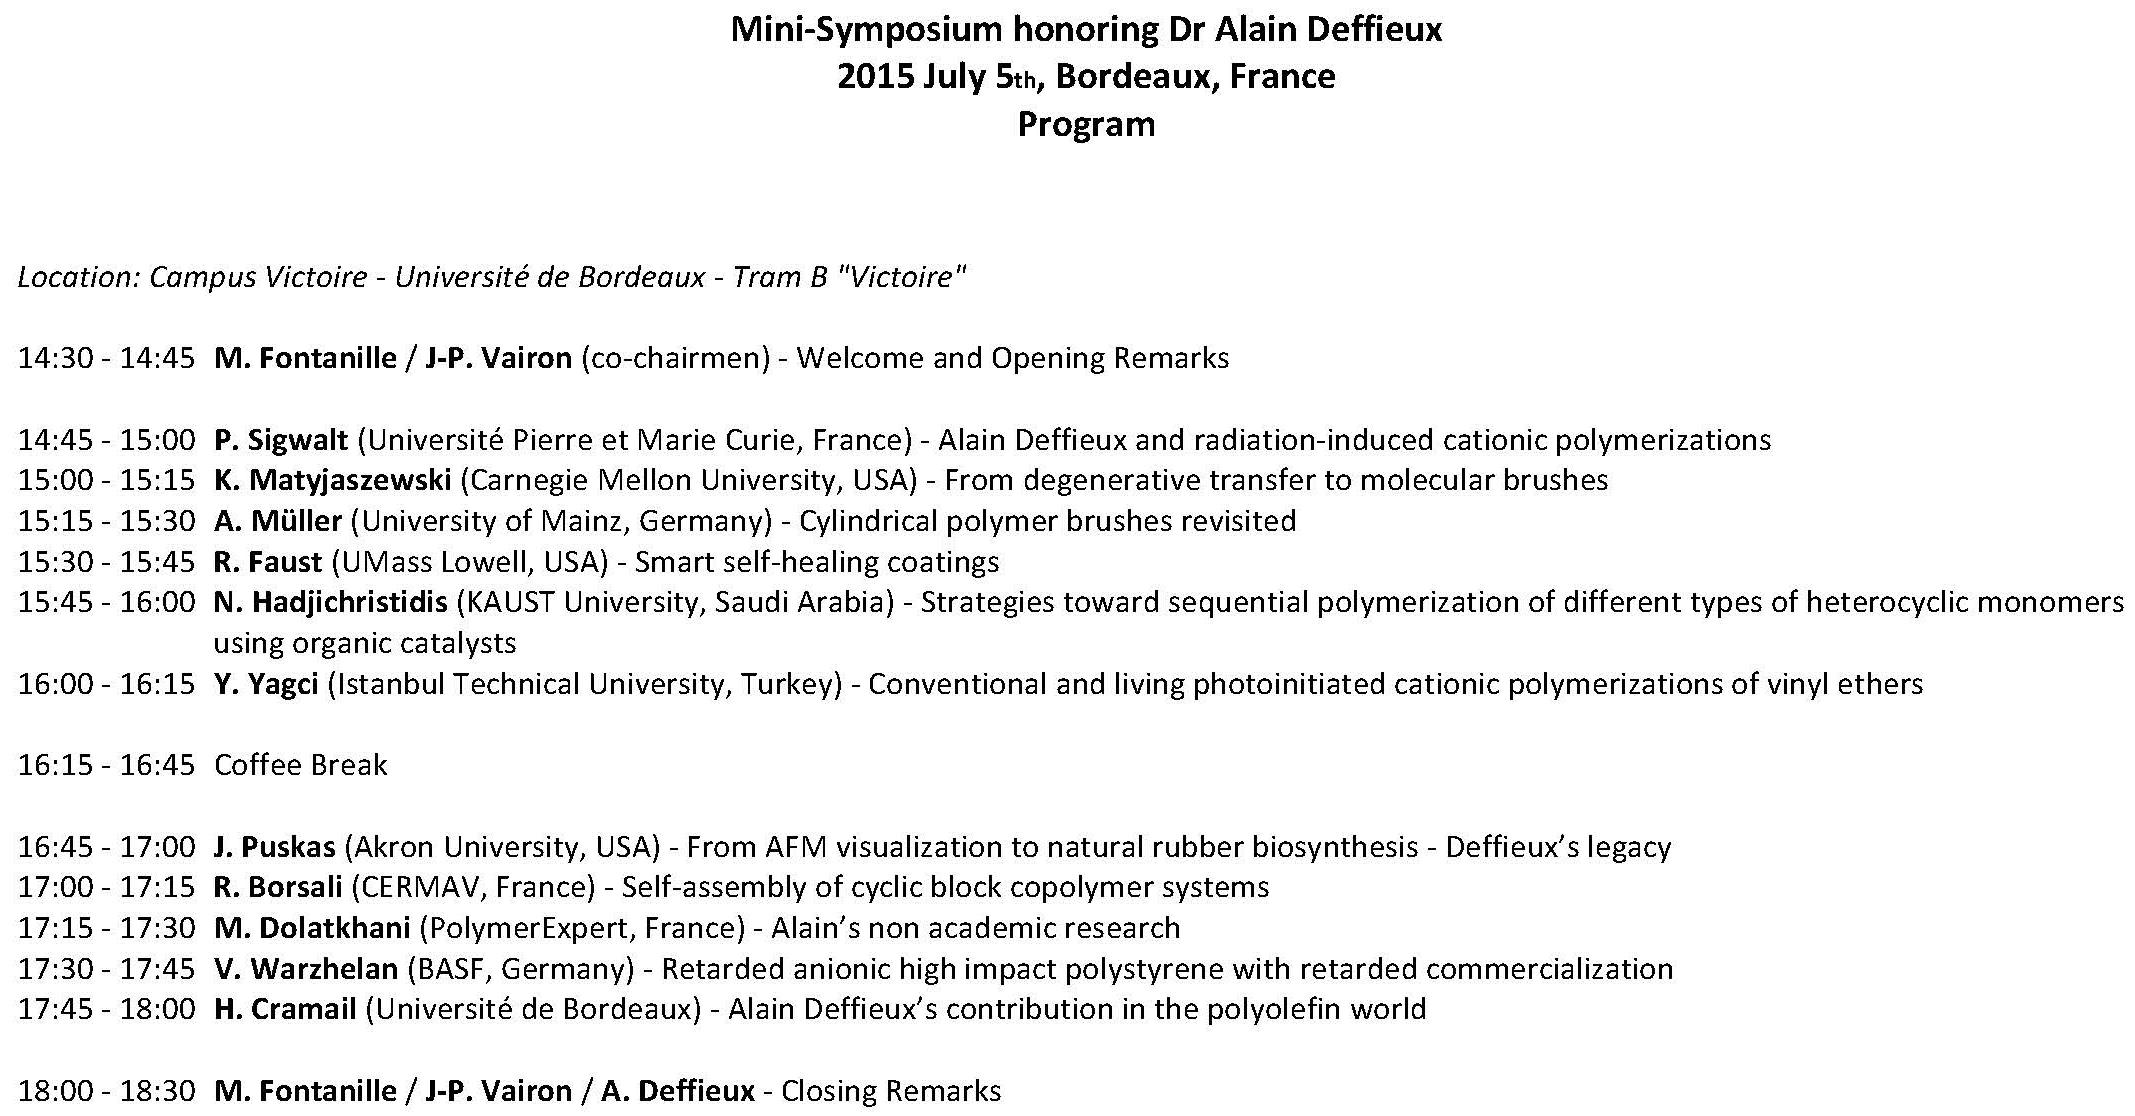 Programme_Mini_Symposium_Alain_Deffieux_01_06_2016.jpg